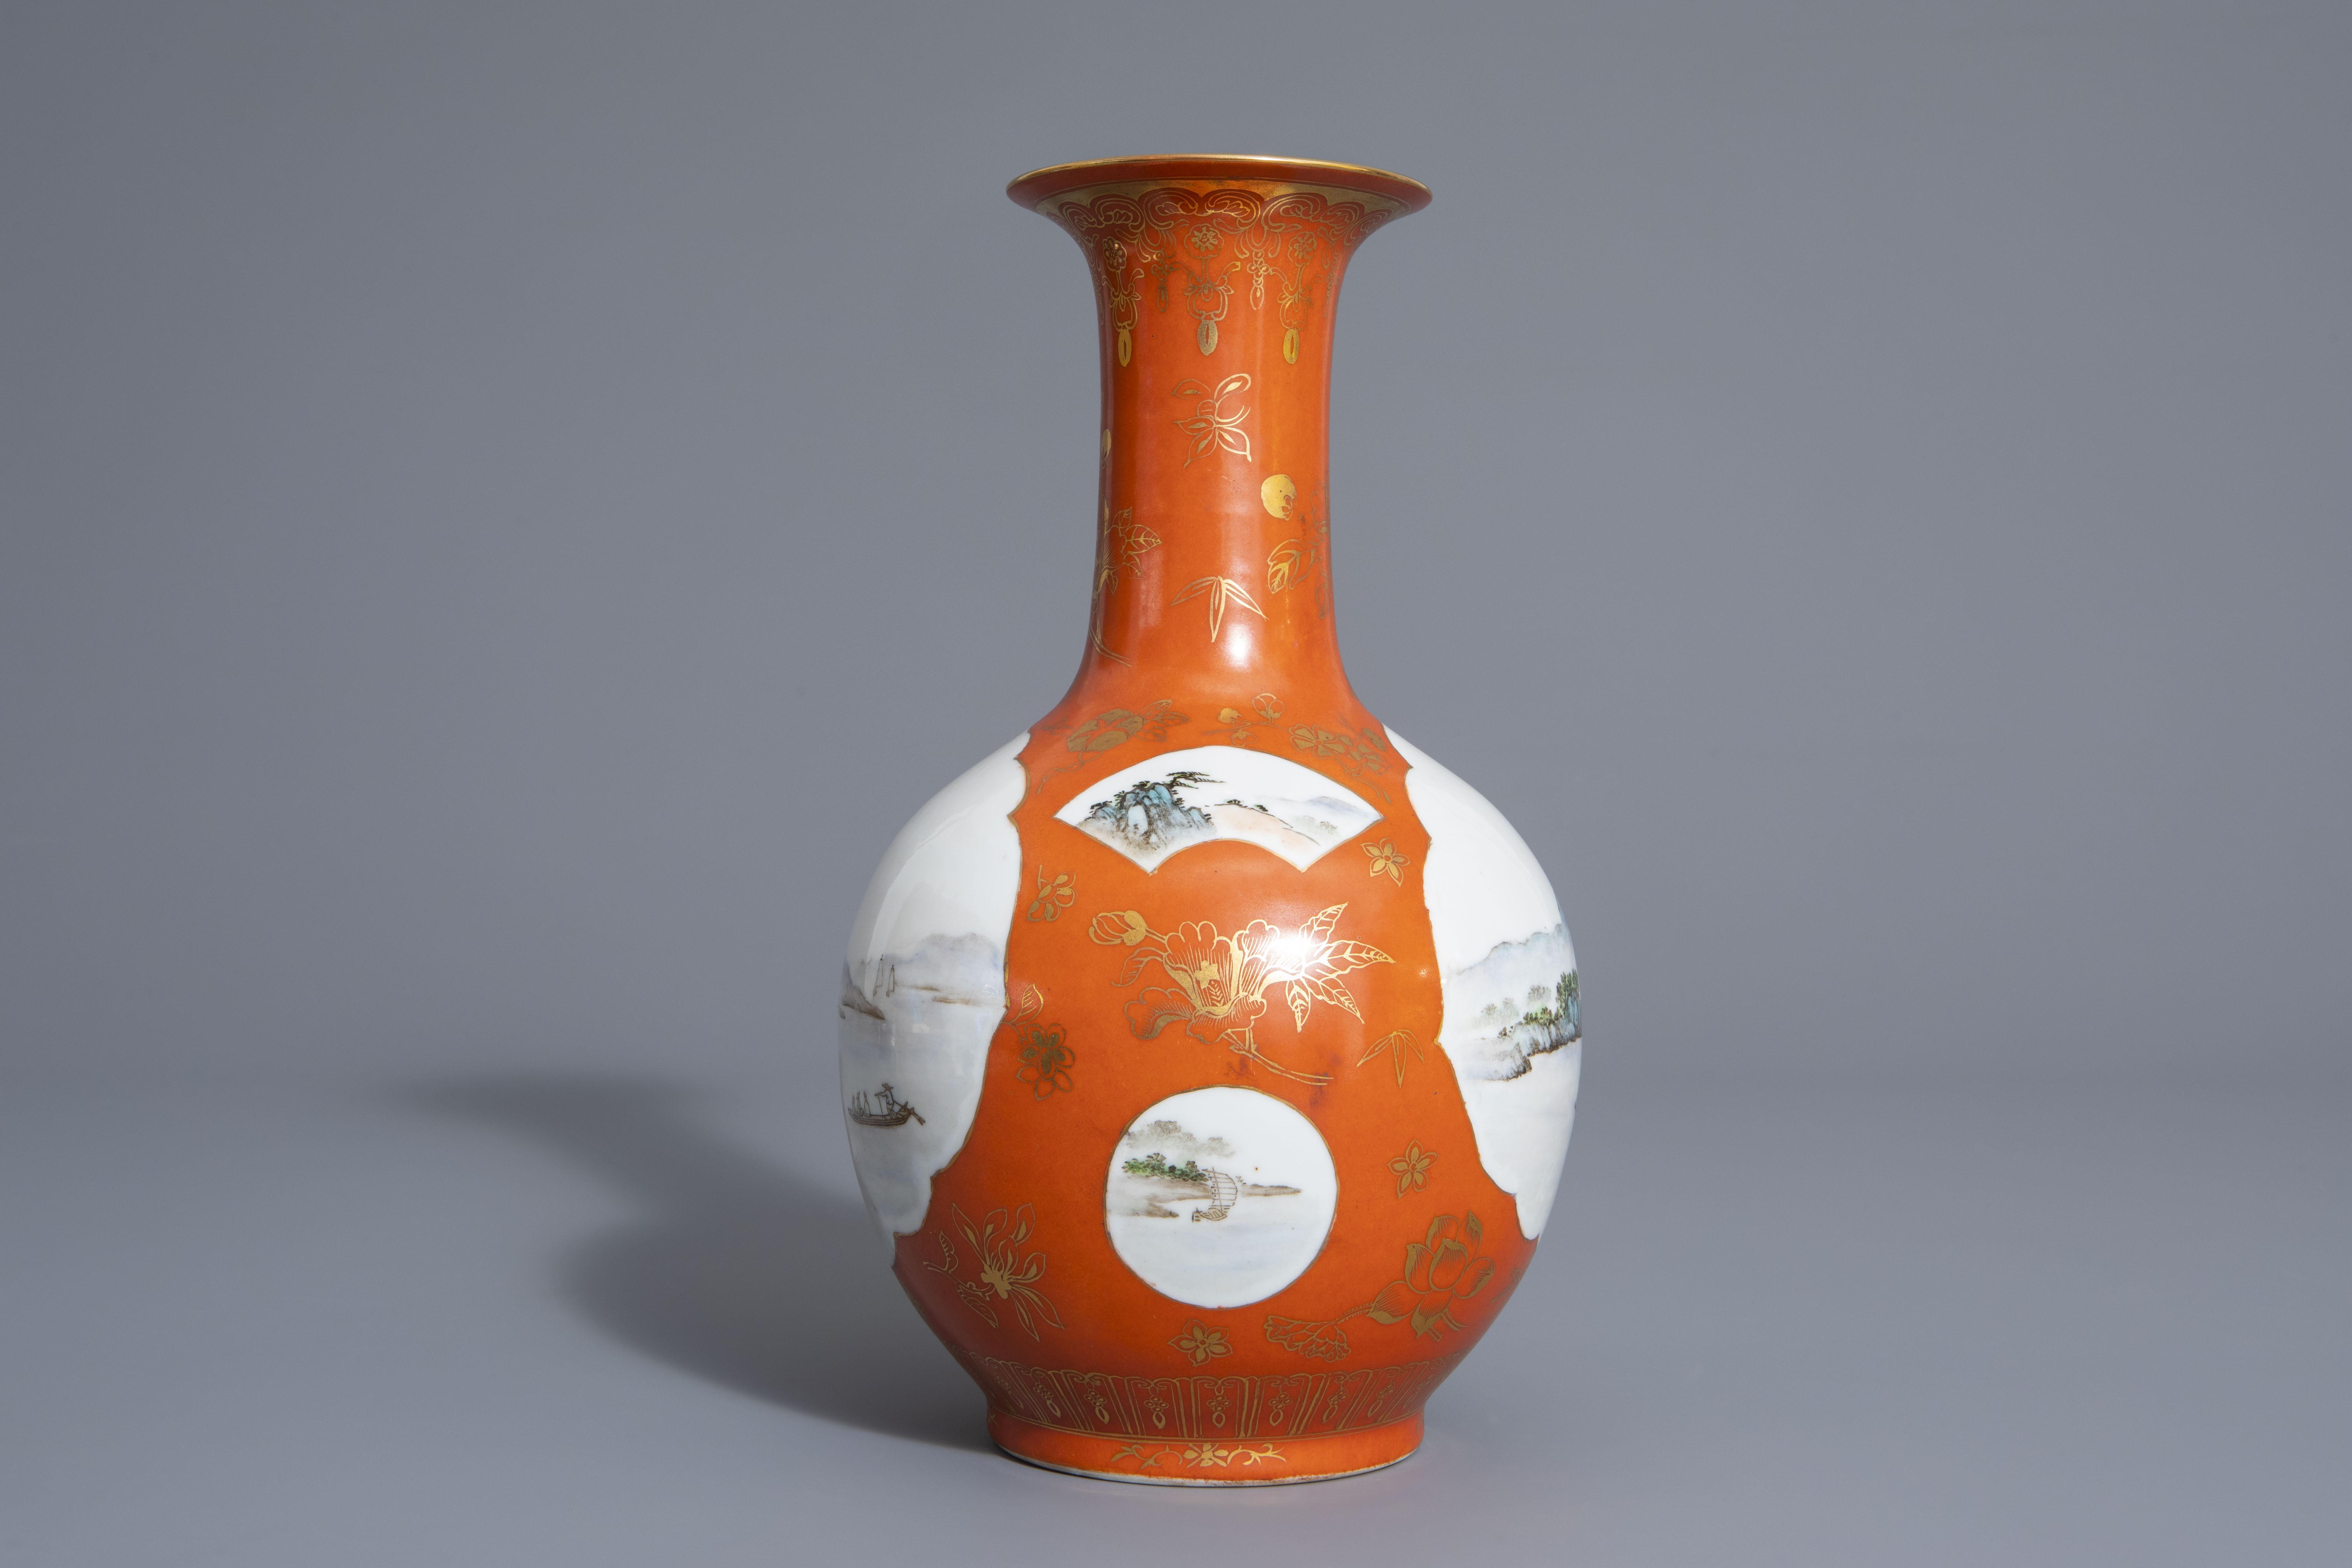 A Chinese bottle shaped orange ground vase with landscapes, Qianlong mark, 20th C. - Image 5 of 7